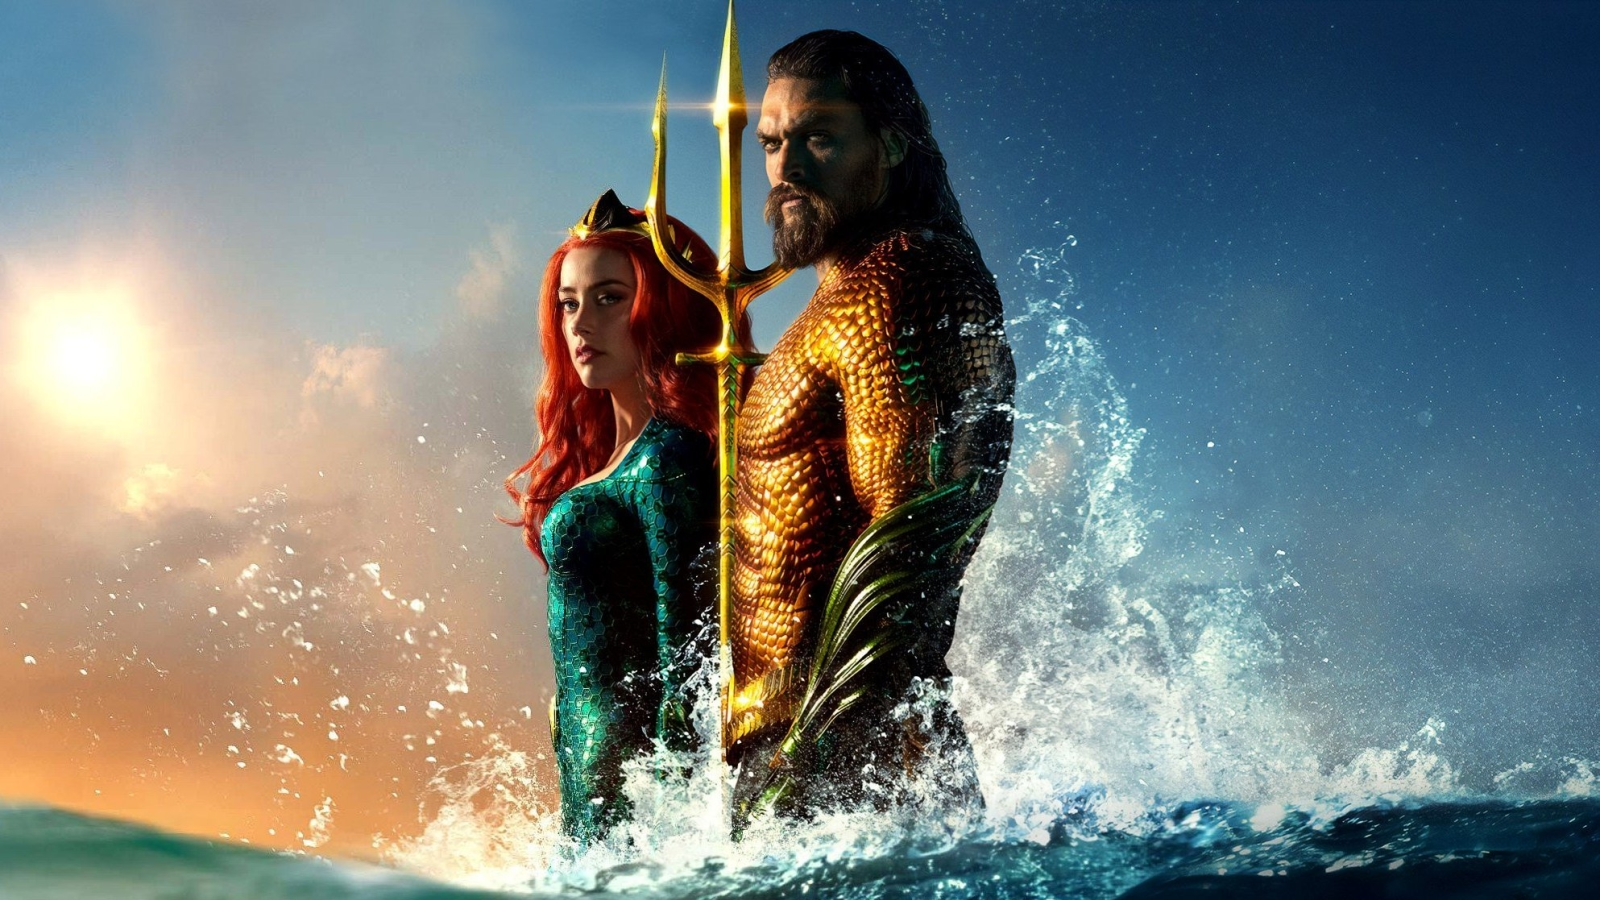 Aquaman 2018 Movie, Full HD 2K Wallpaper